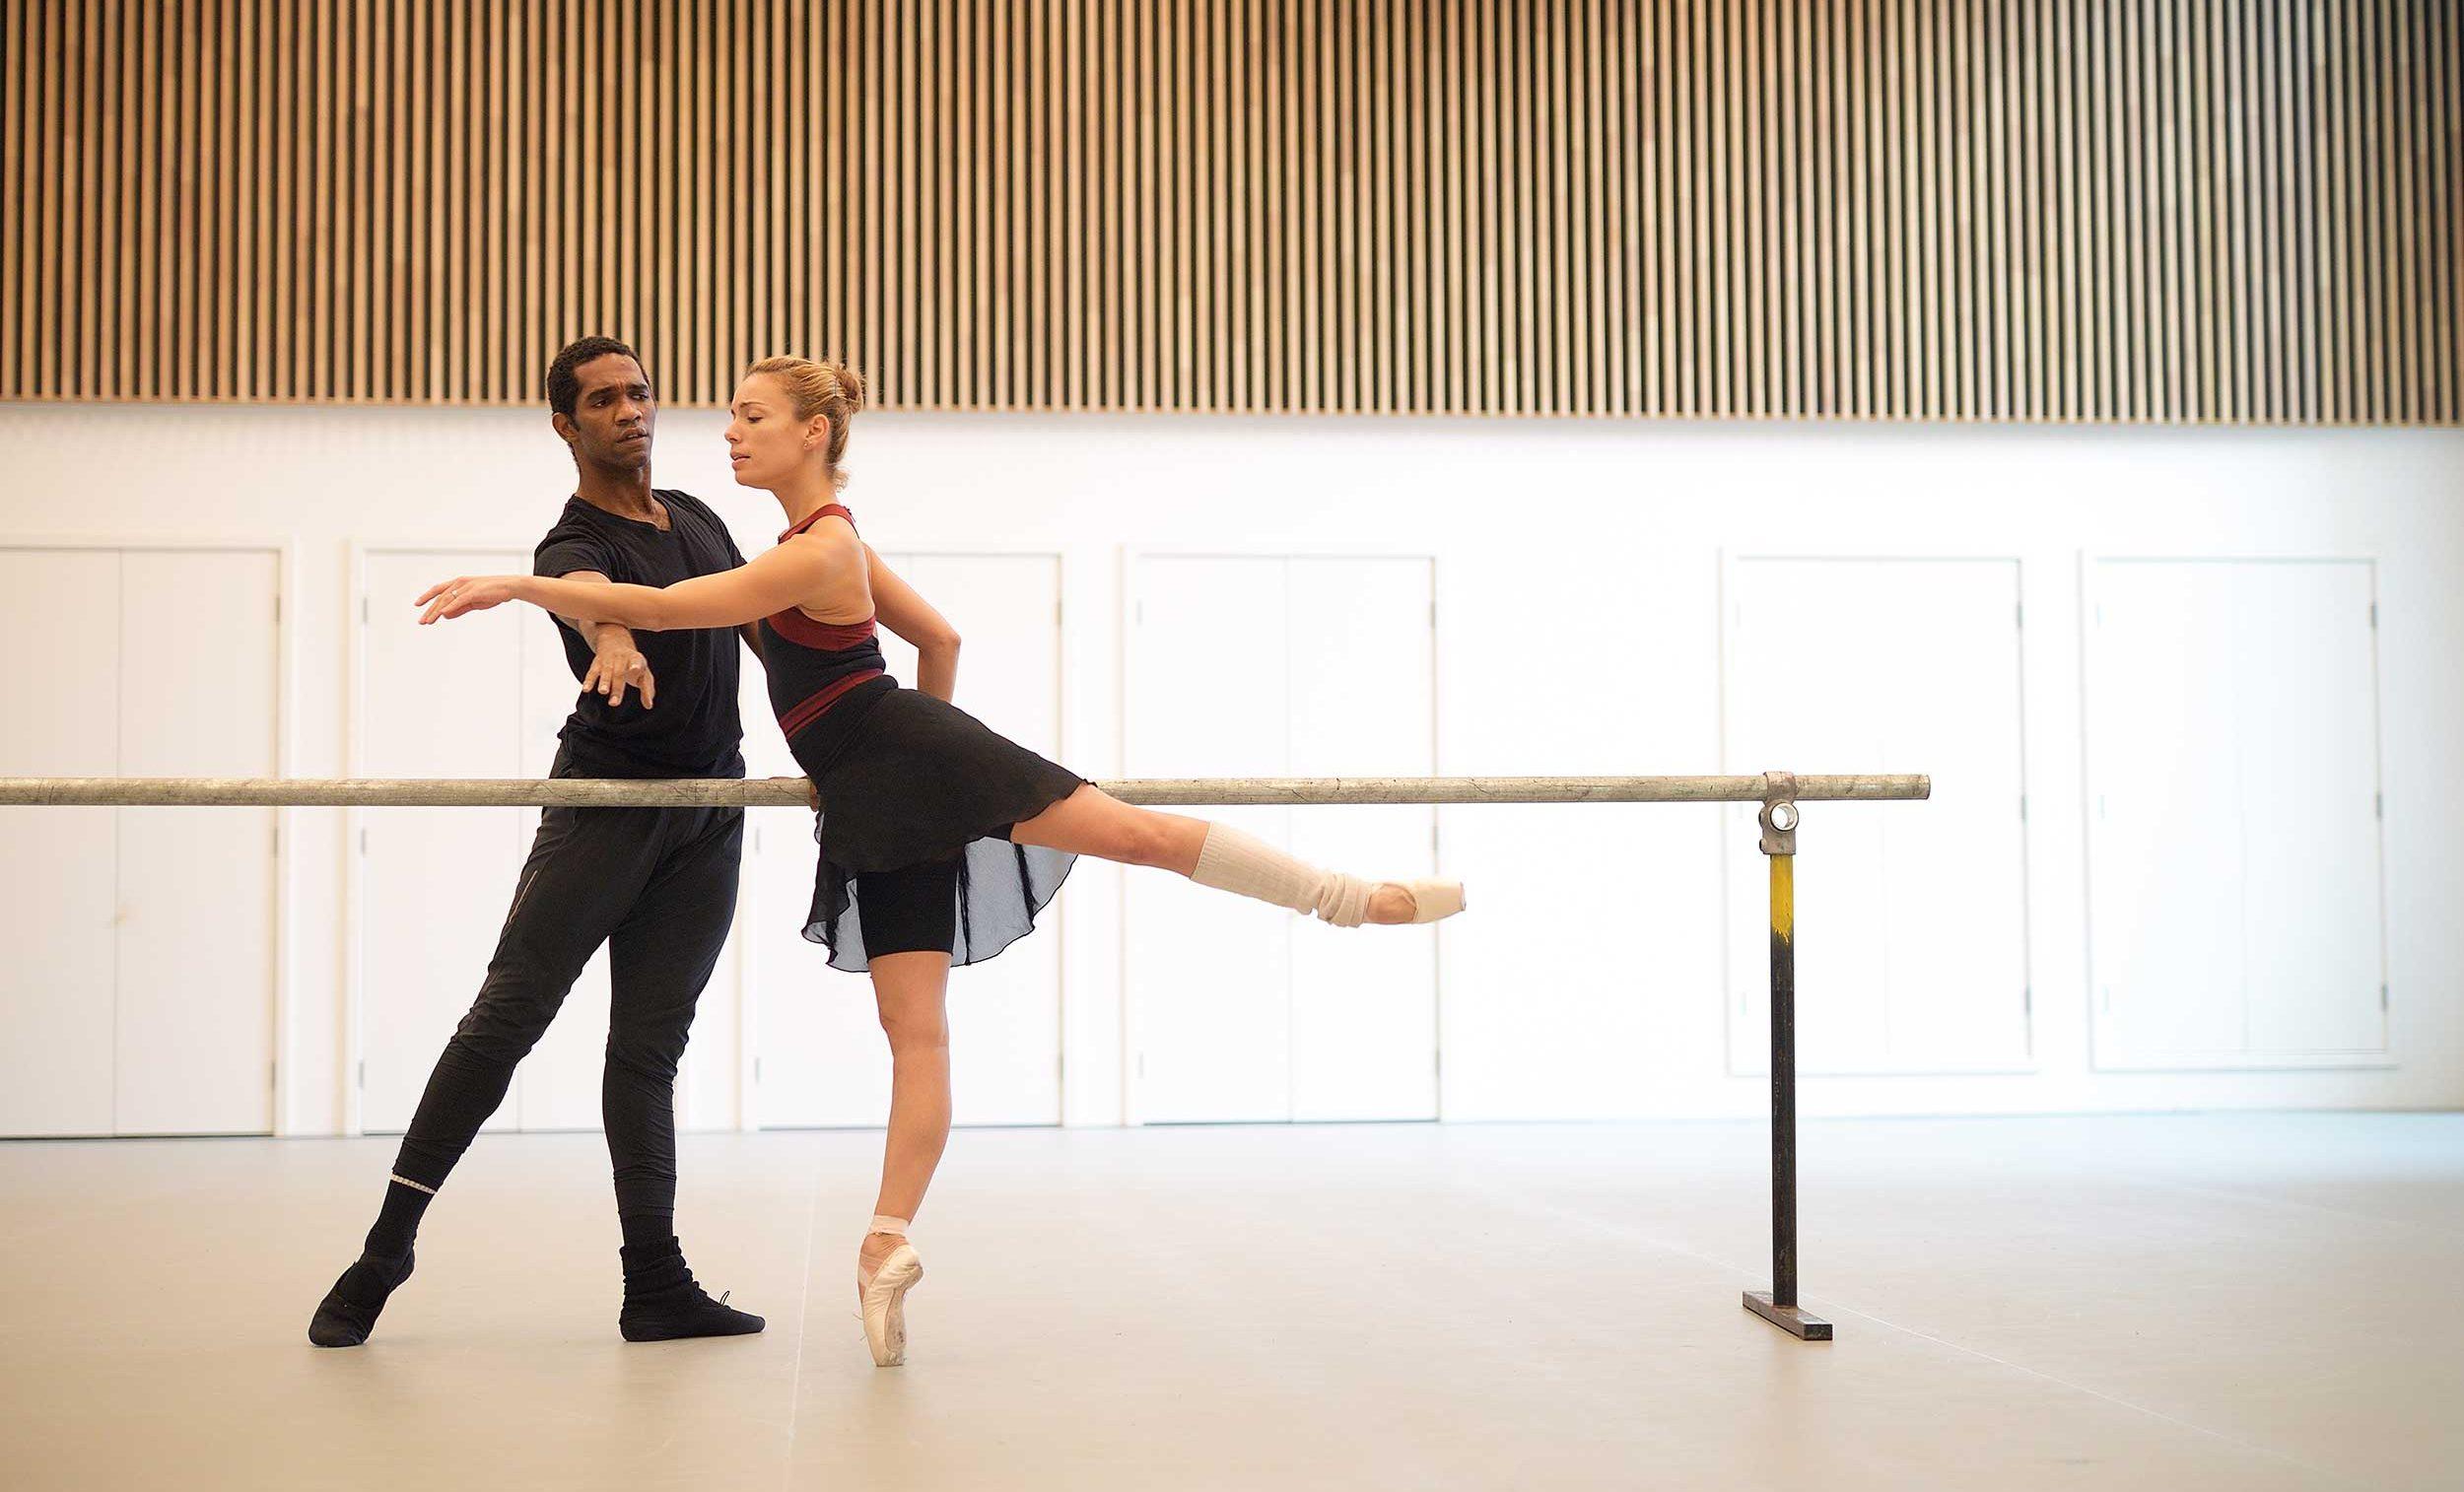 Fernanda-Oliviera-and-Junor-Souza-rehearse-Ben-Stevenson's-Three-Preludes-ahead-of-ENB's-70th-Anniversary-Galas-(C)-Laurent-L-(4)